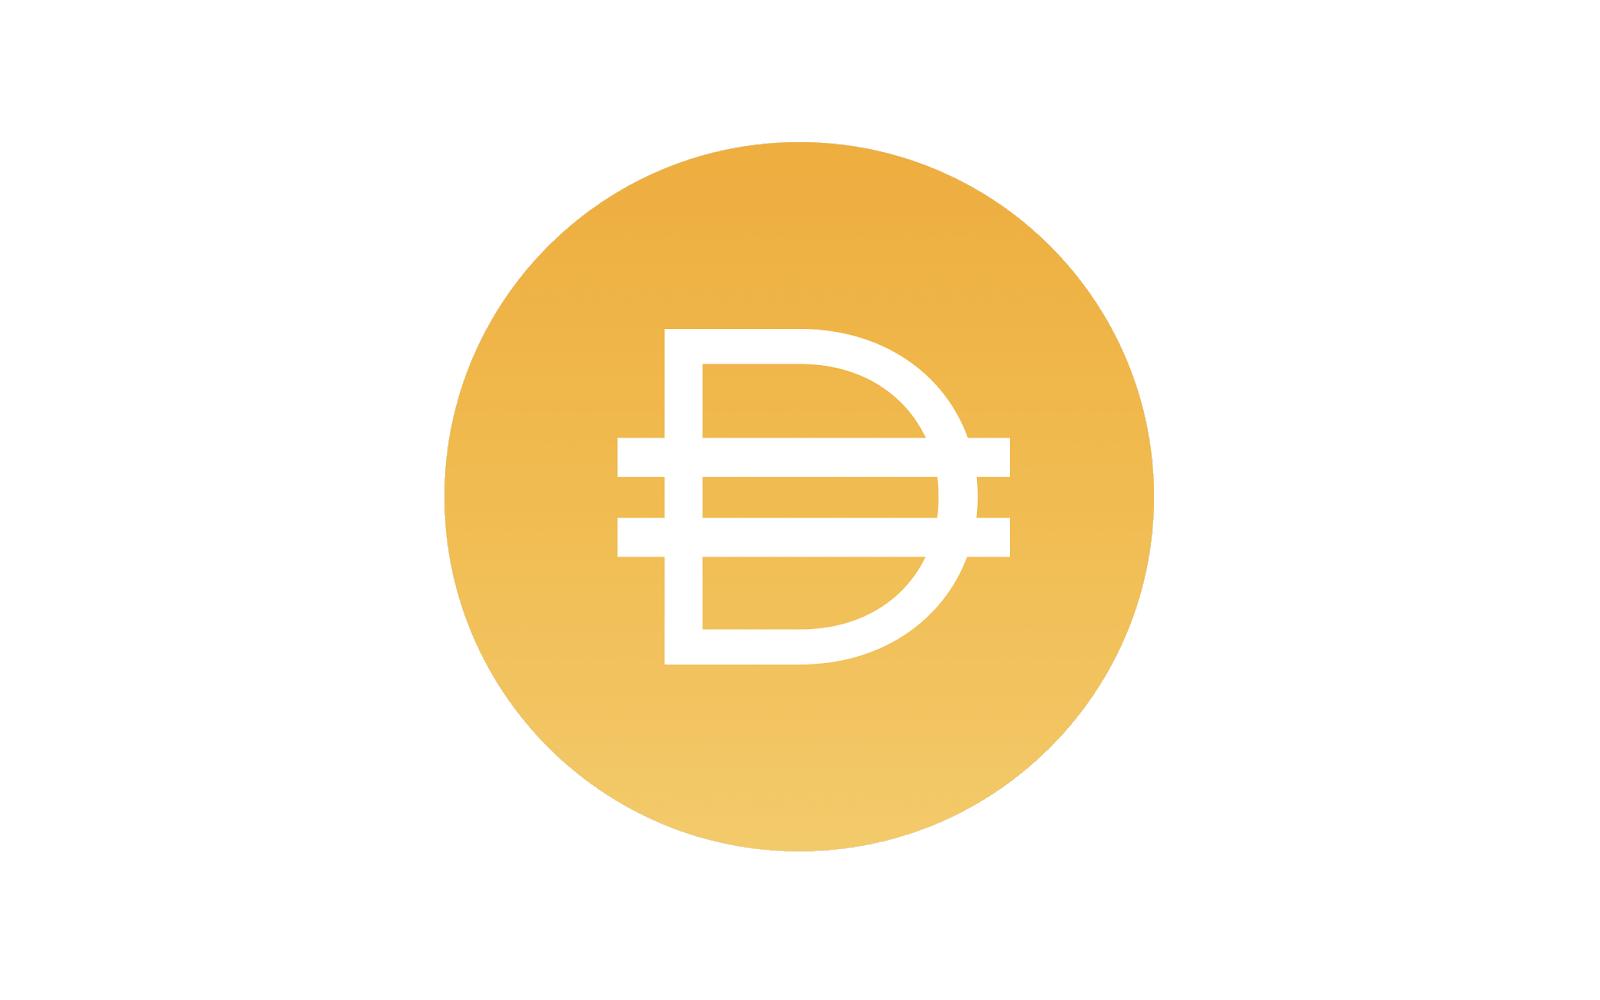 The Dai Savings Rate (DSR)